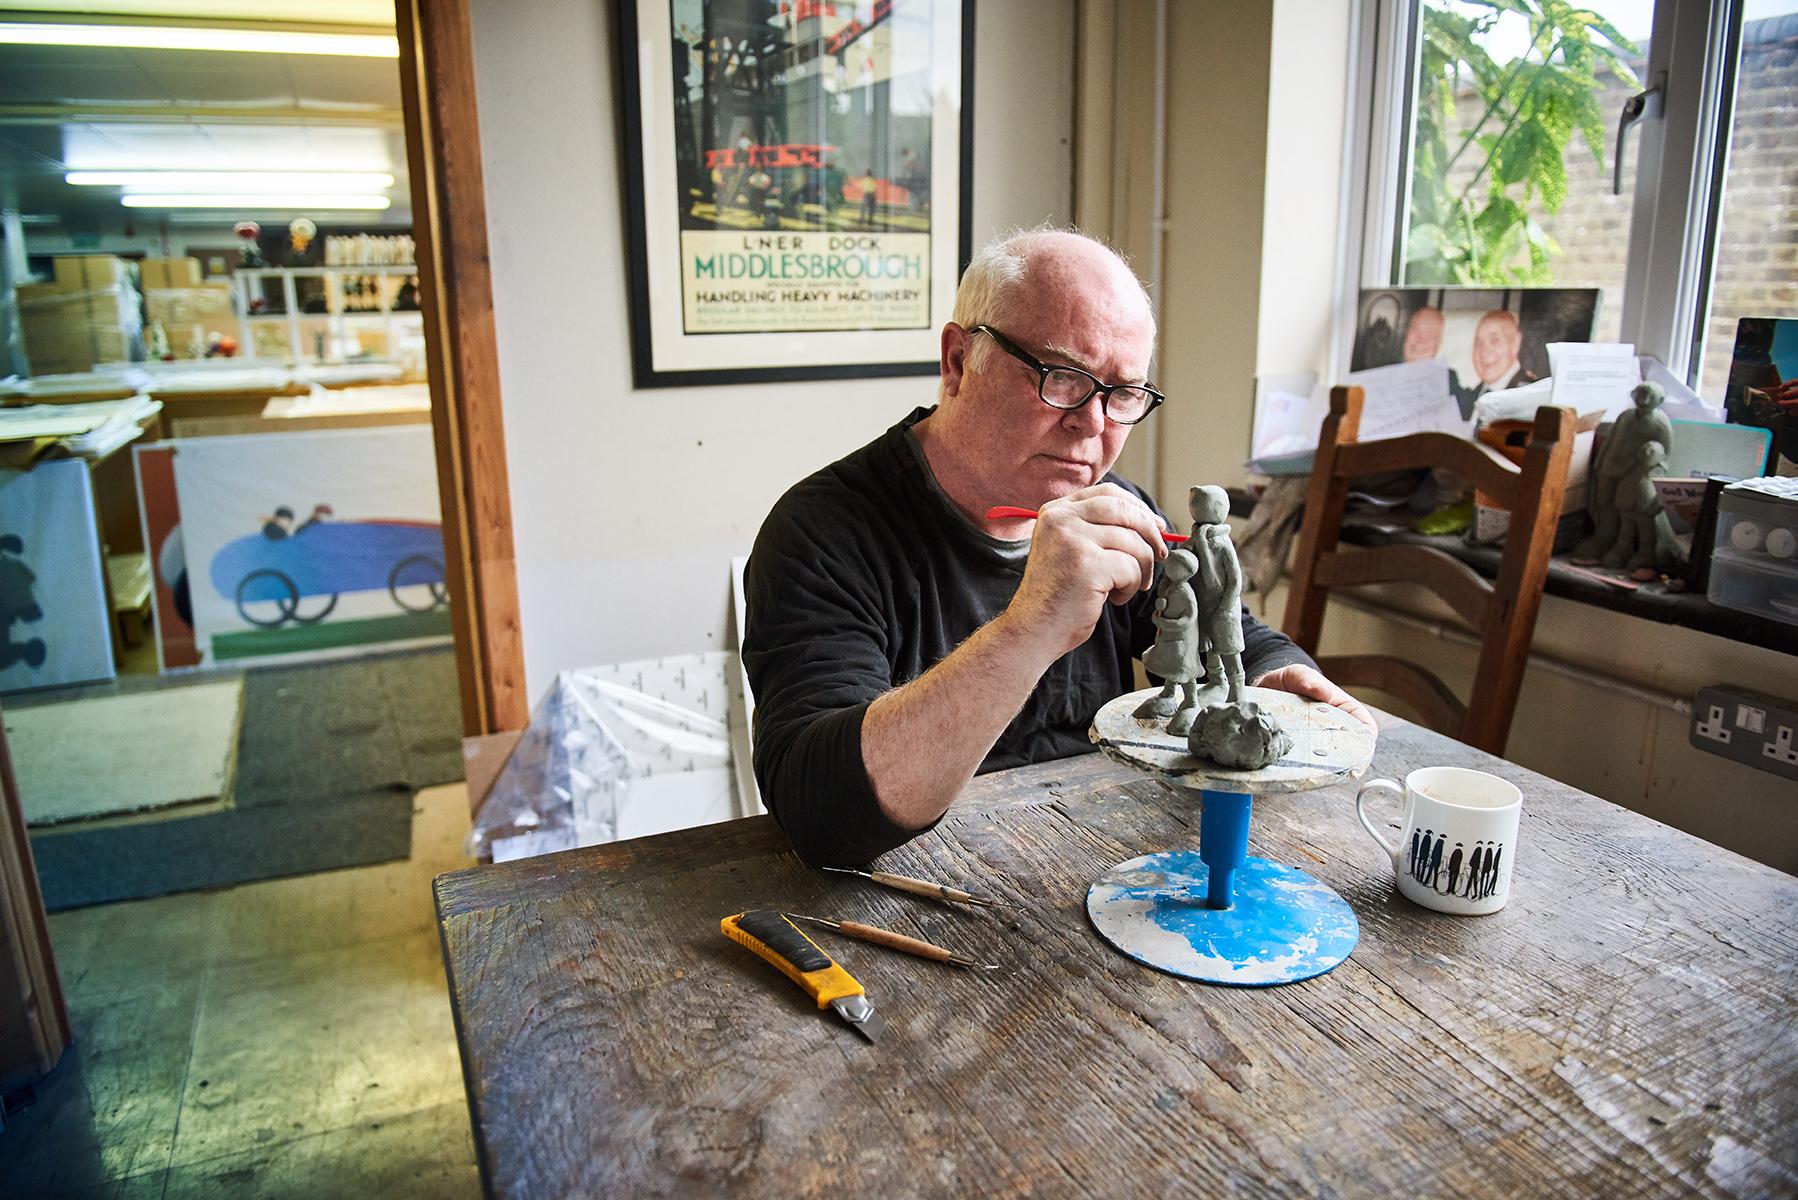 Artist Mackenzie Thorpe in the studio